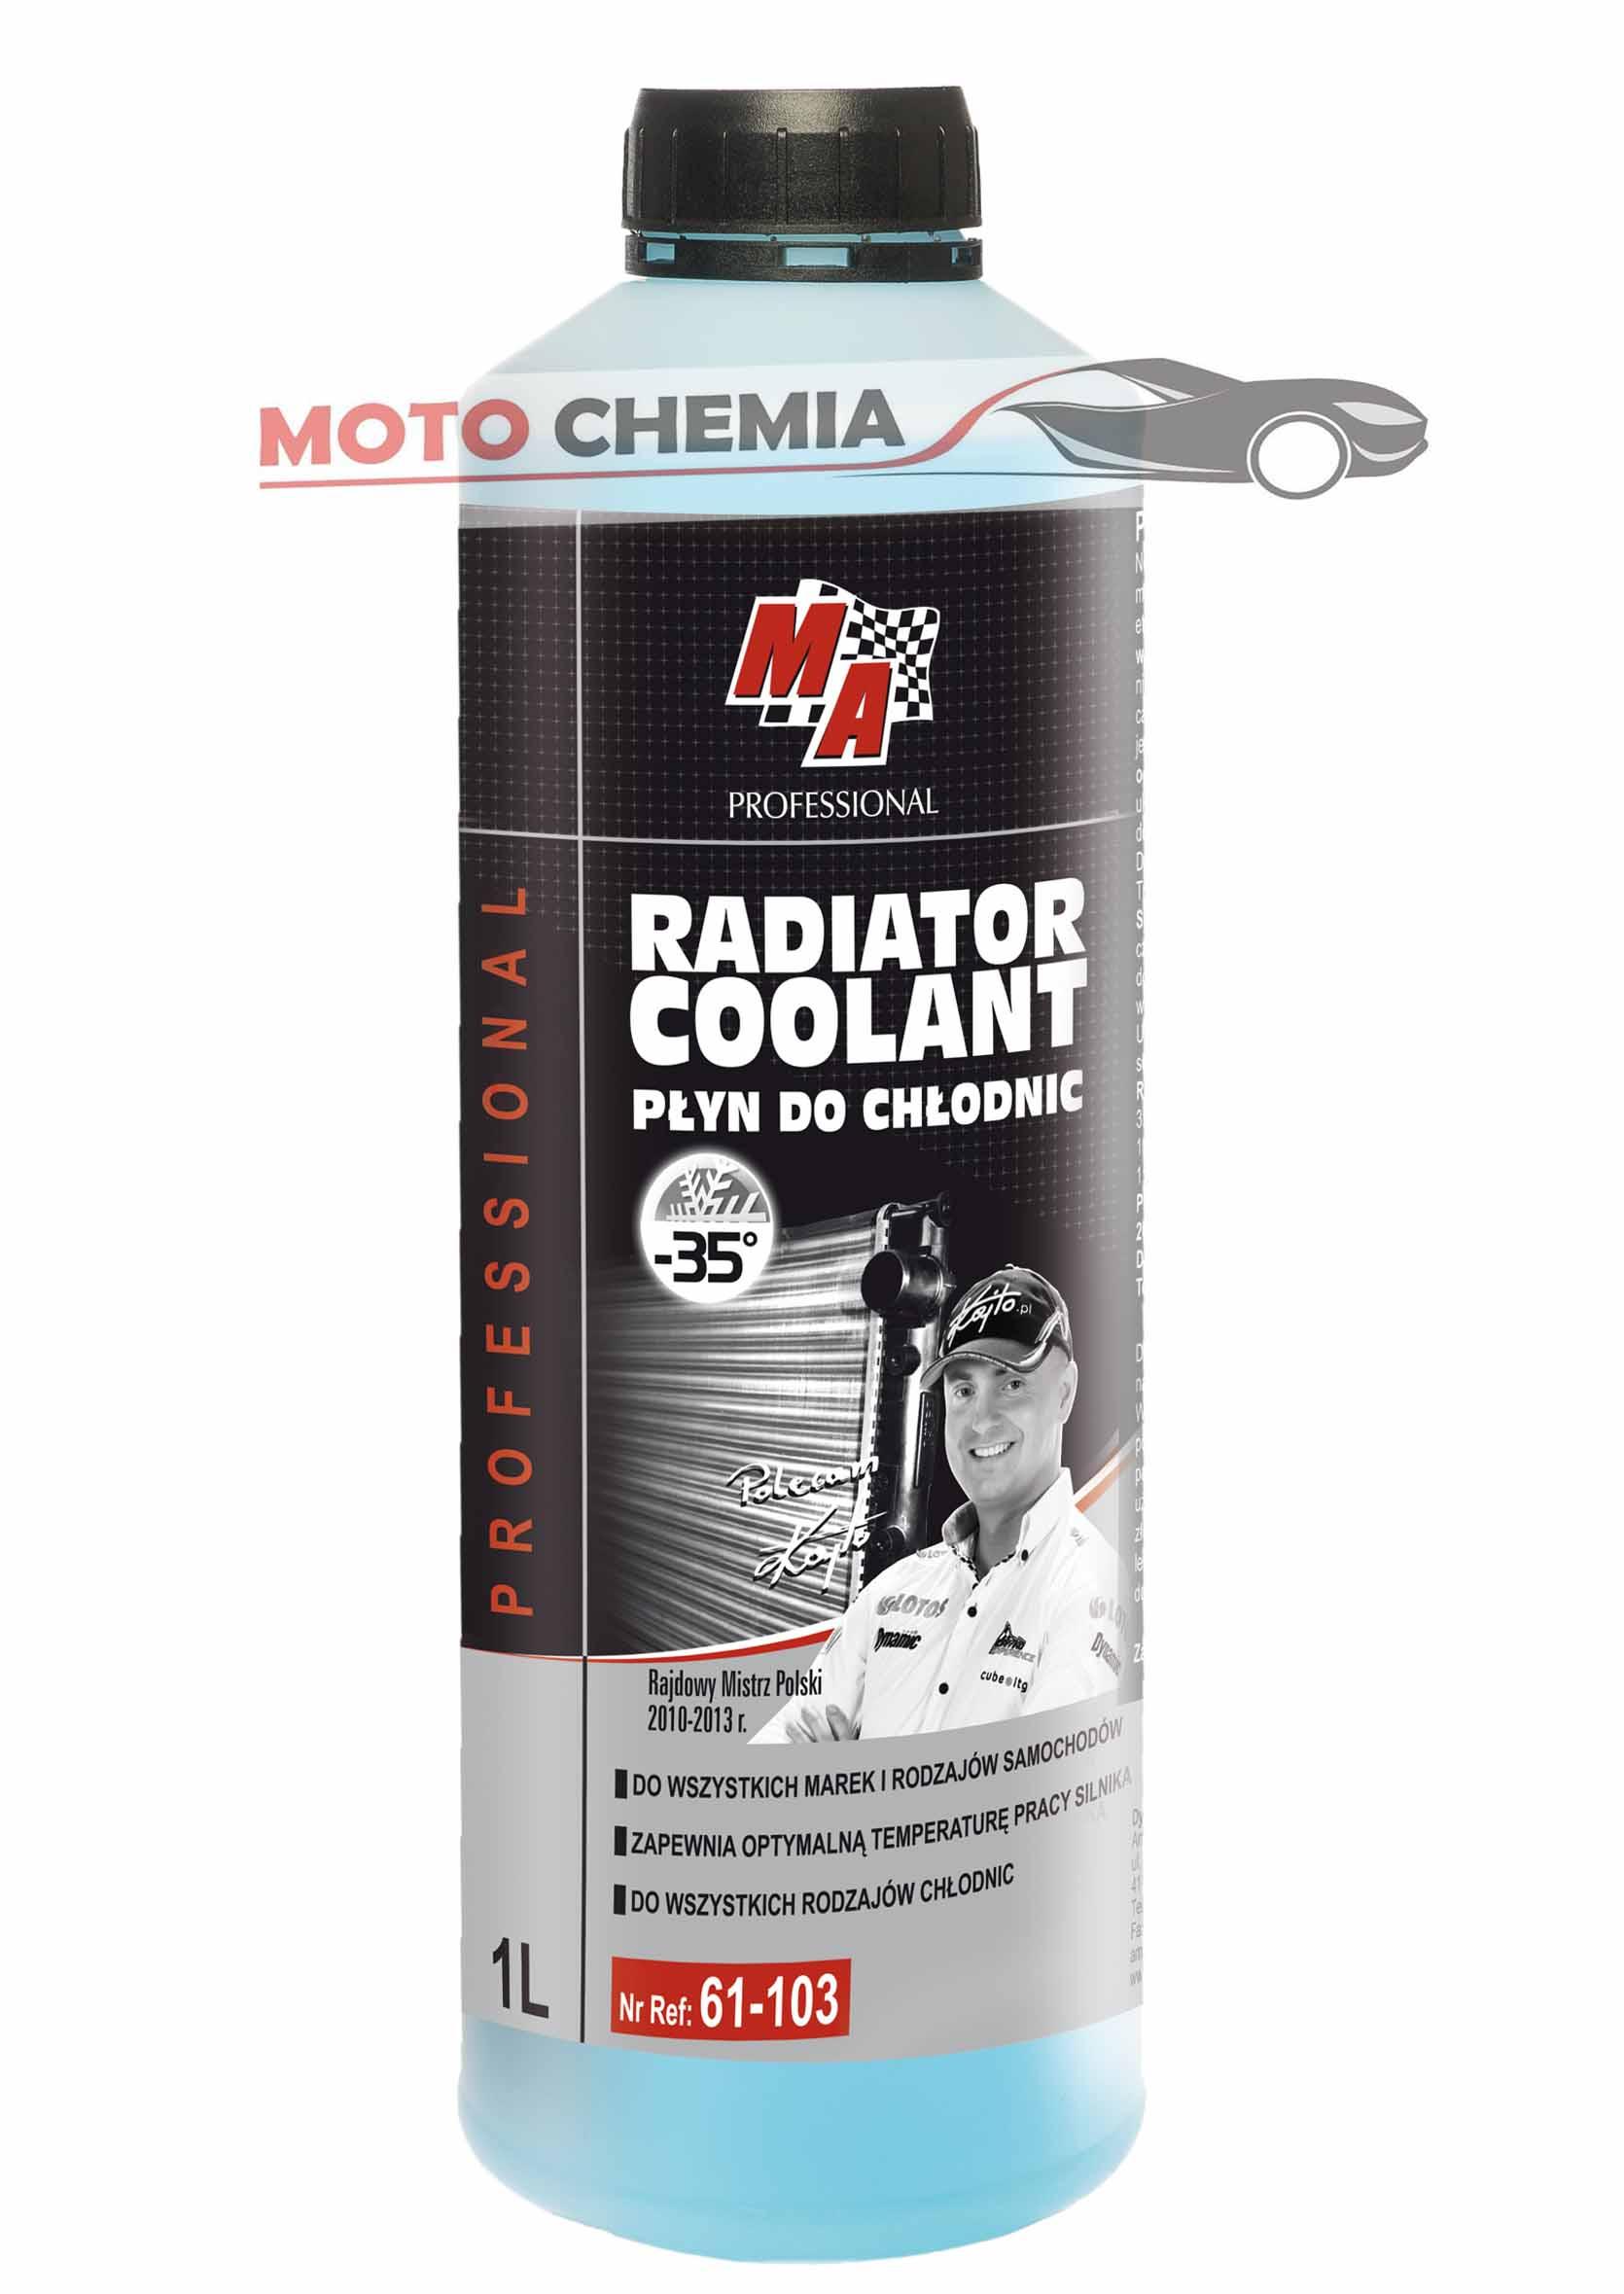 MA Professional Radiator Coolant Płyn do Chłodnic Niebieski -35C 1L